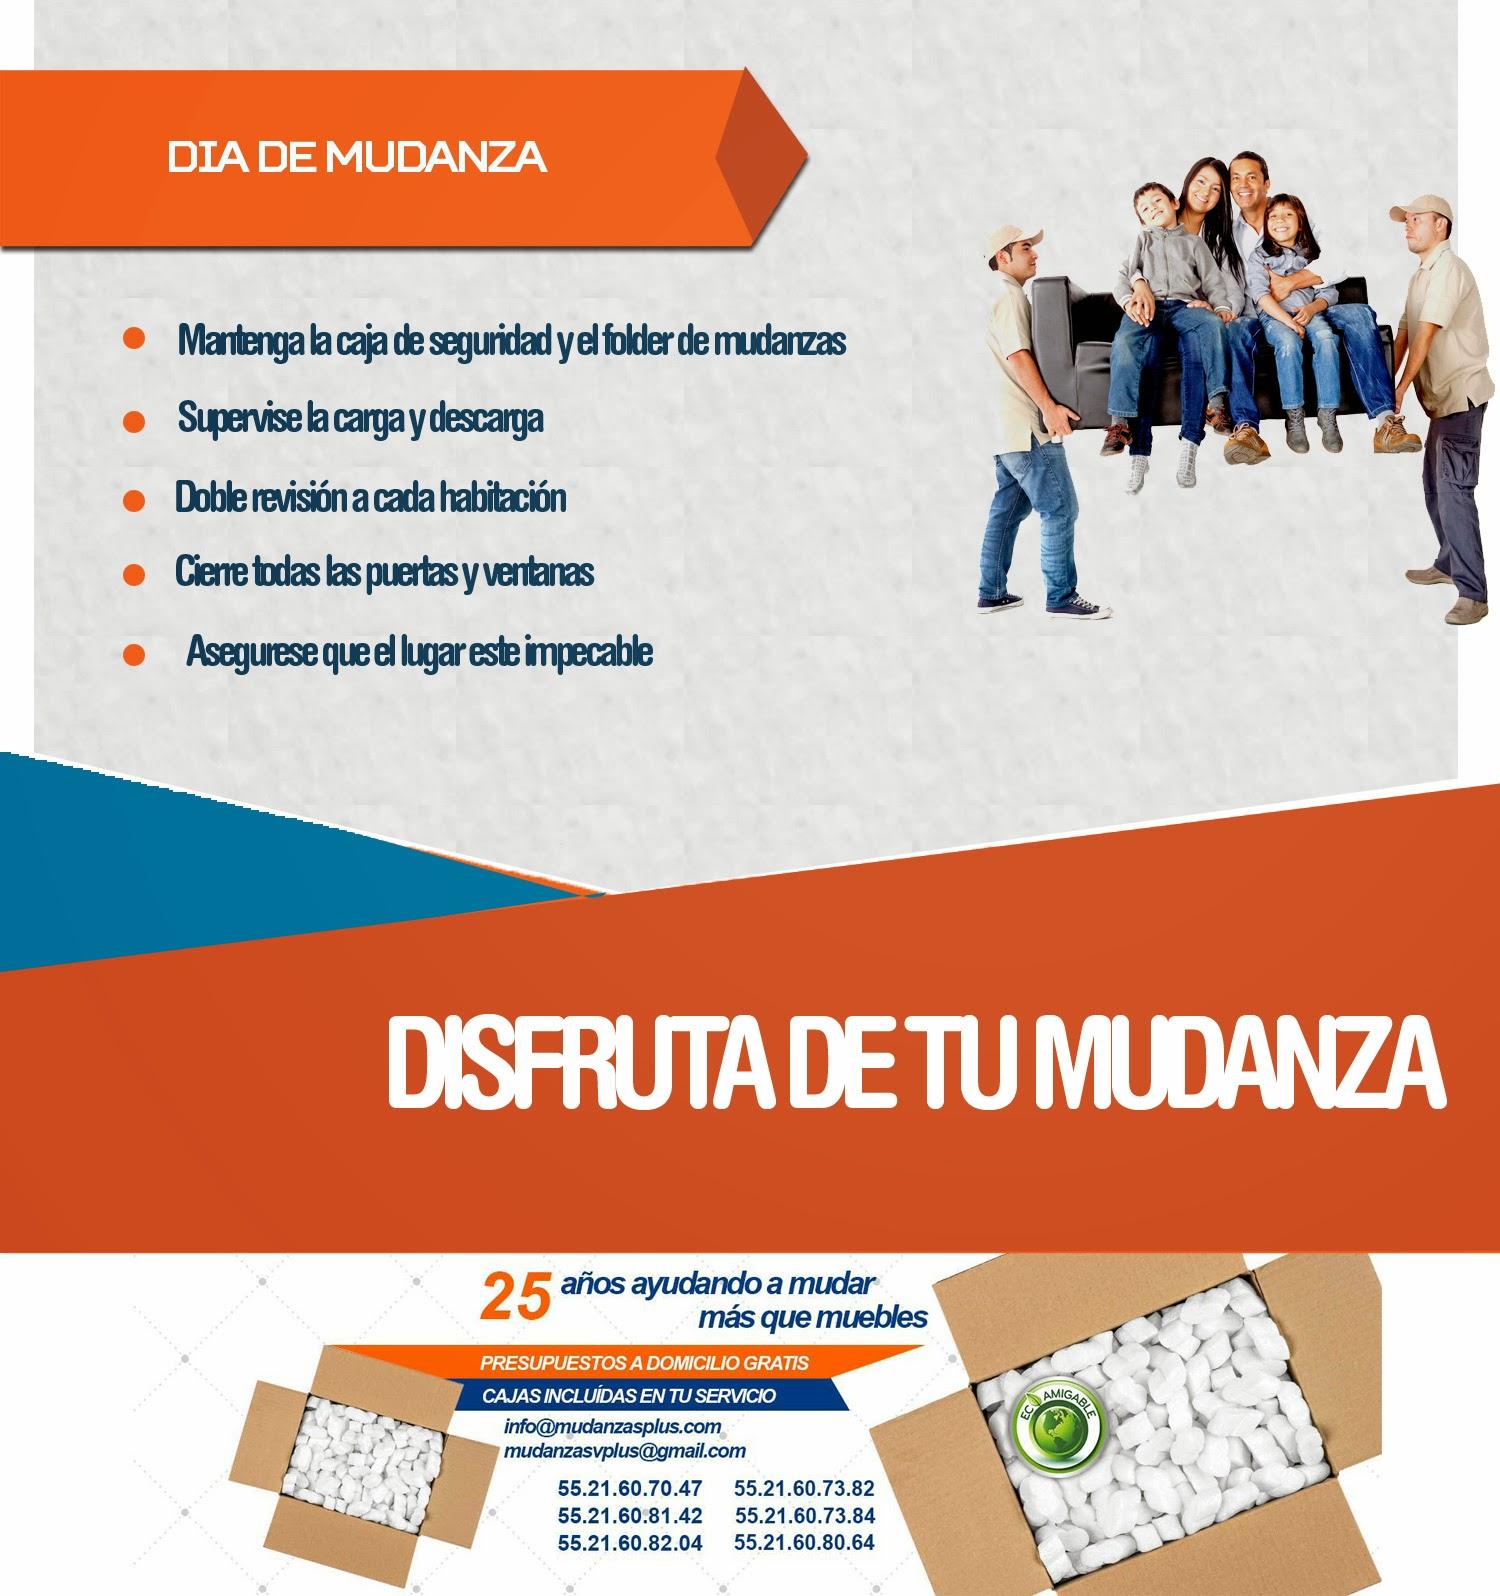 www.mudanzasplus.com